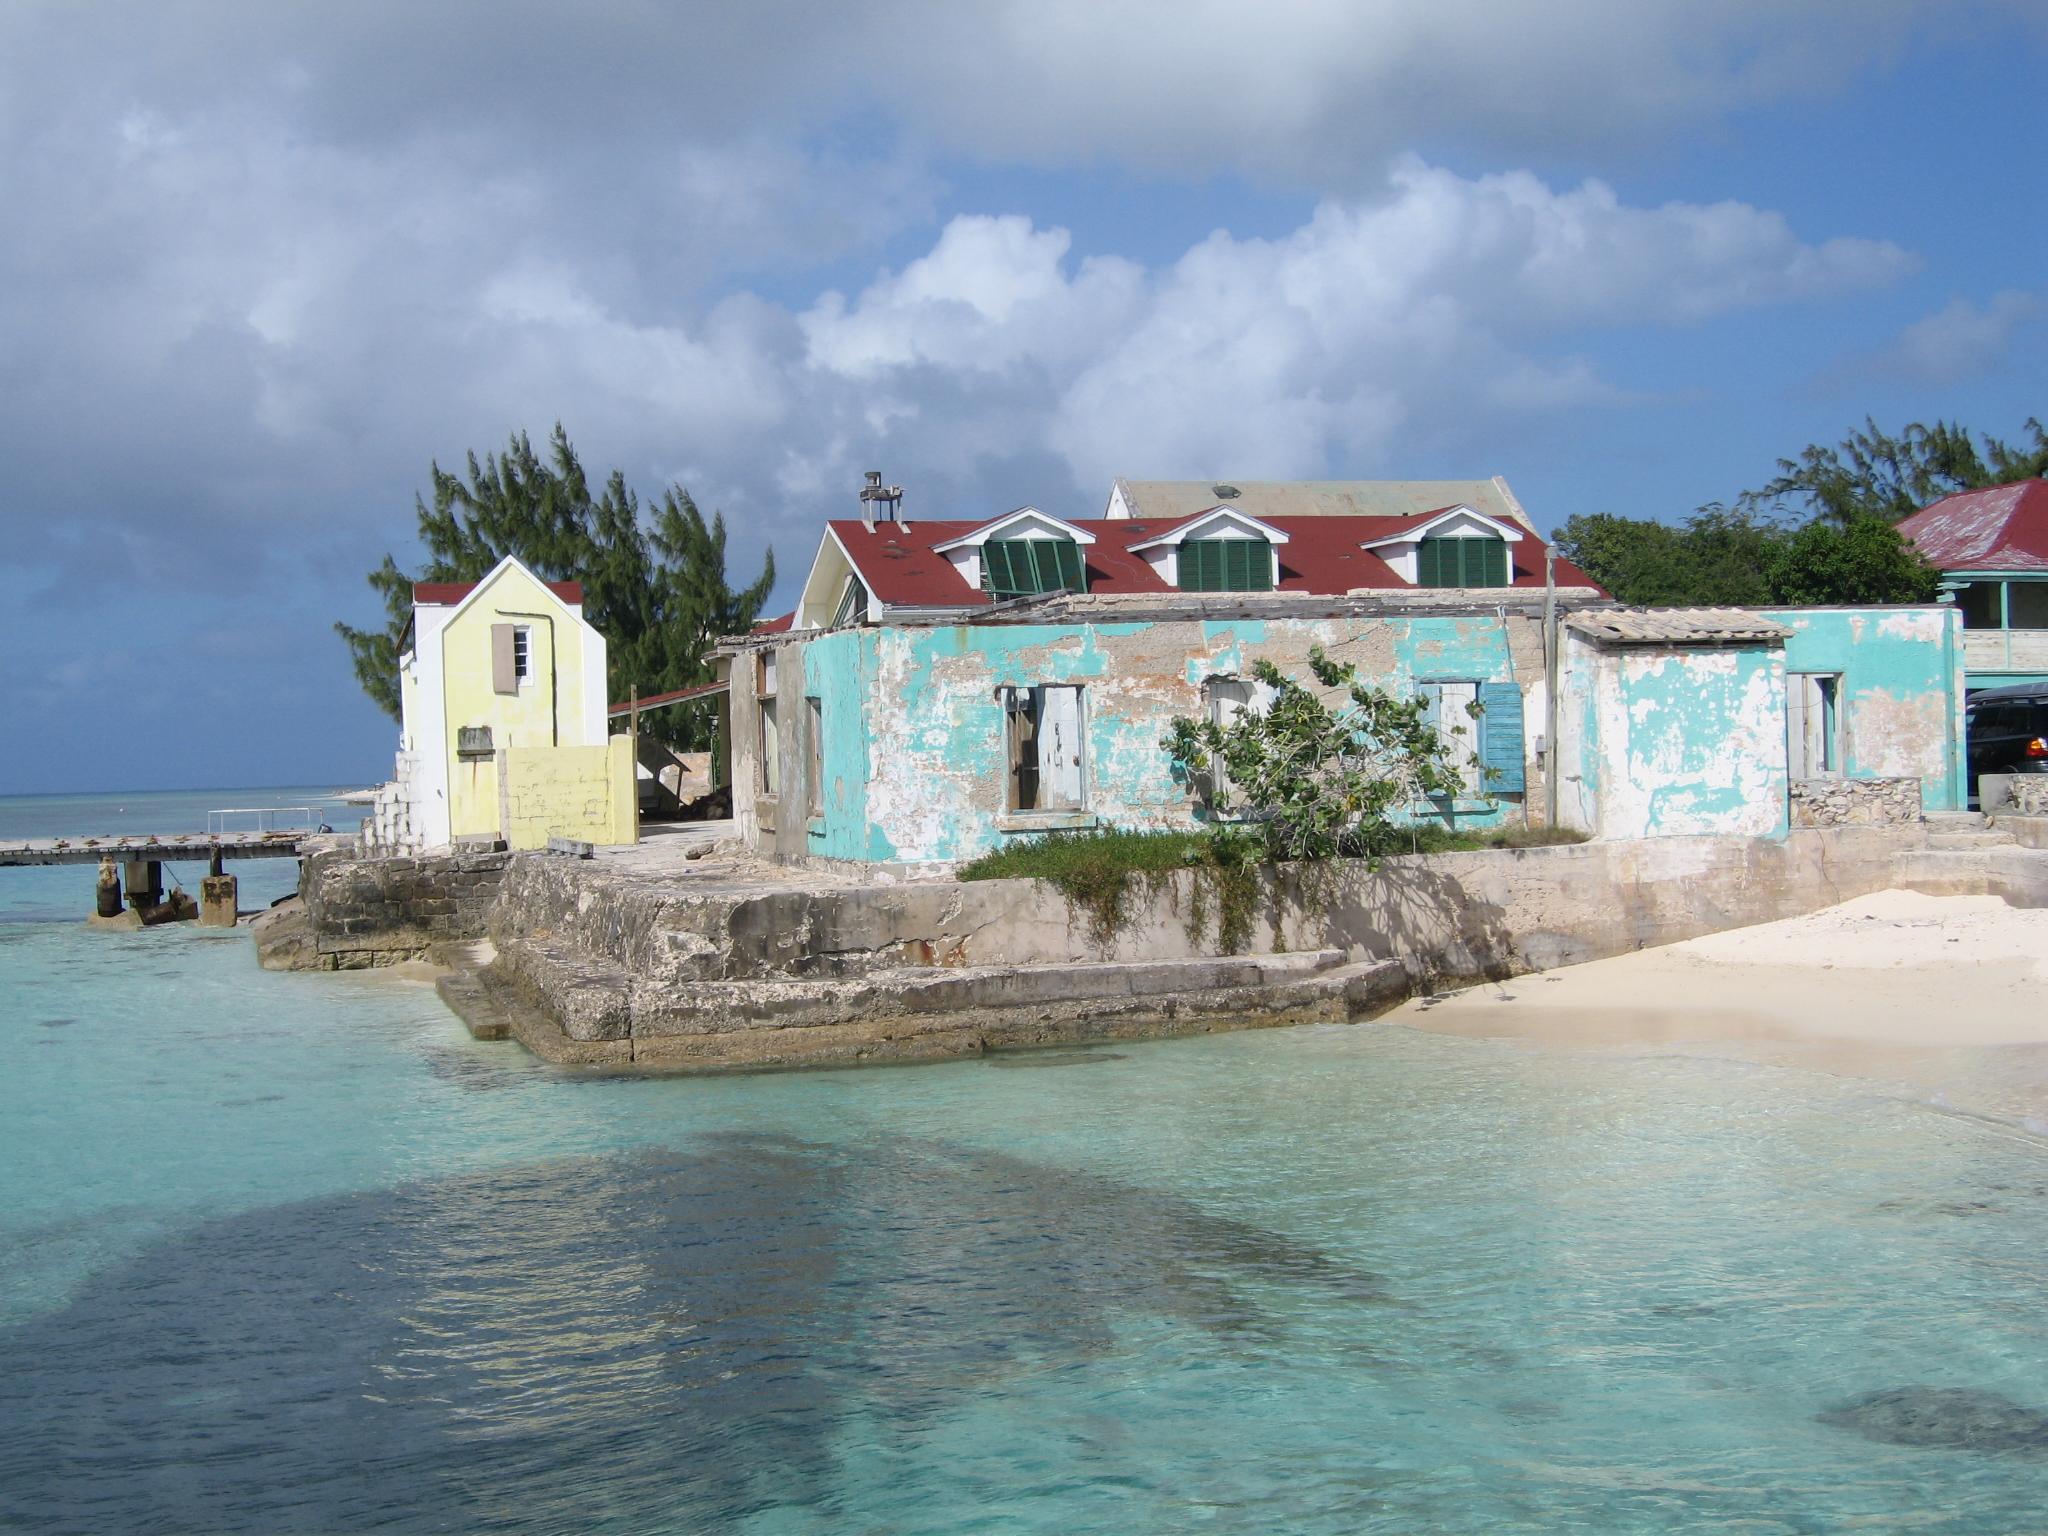 Margaritaville Beach Resort Cayman Islands